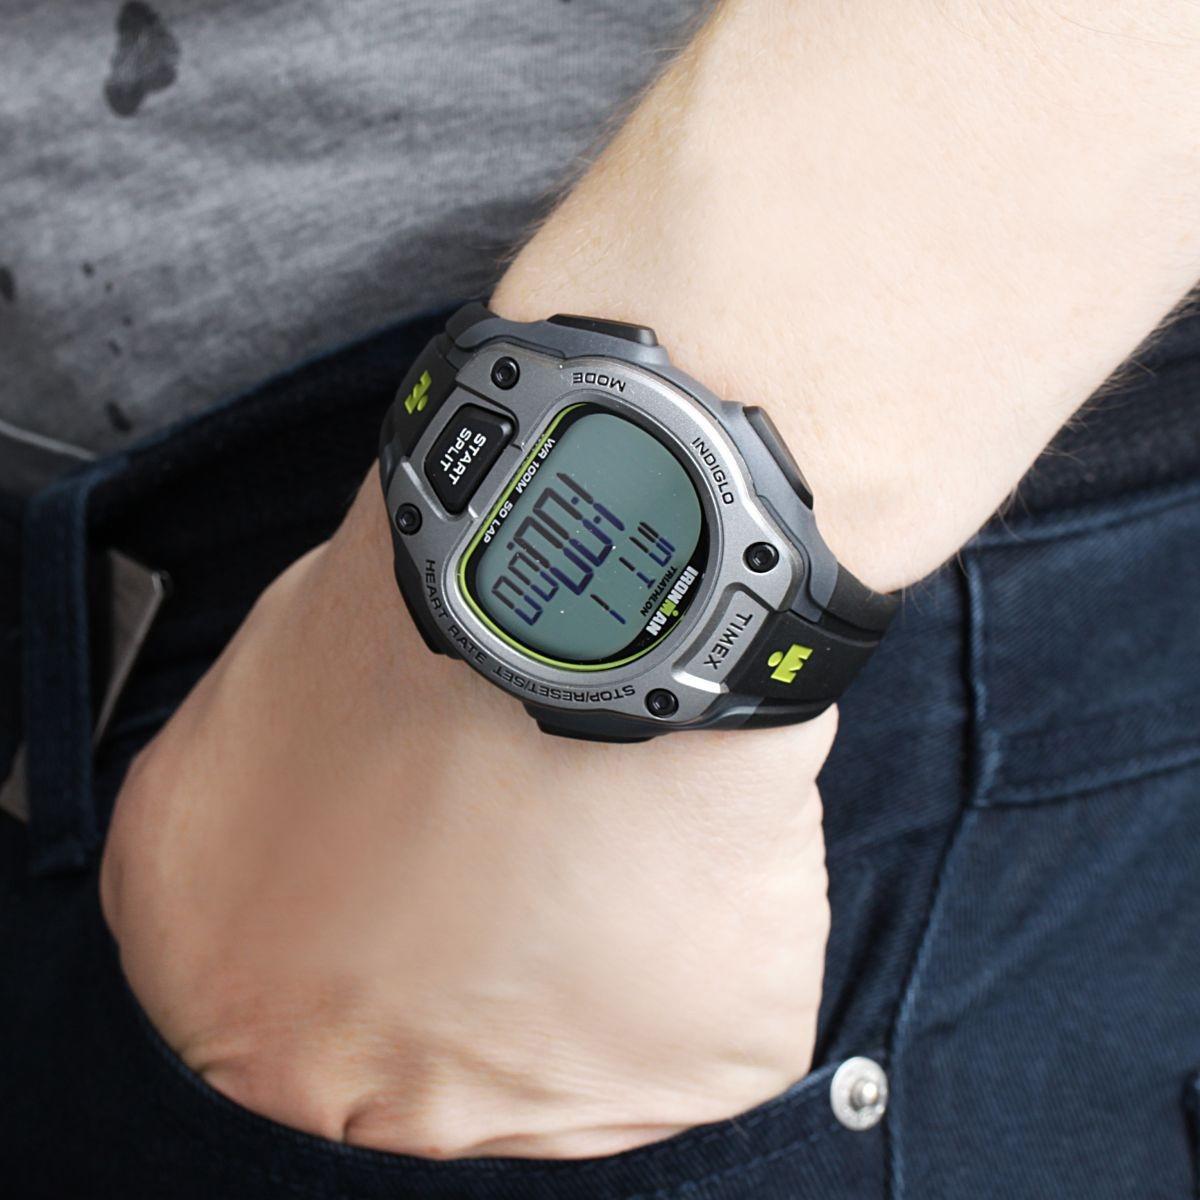 6dc7da5538bc reloj timex t5k719 t5k720 pulsometro iroman trainer calorias. Cargando zoom.